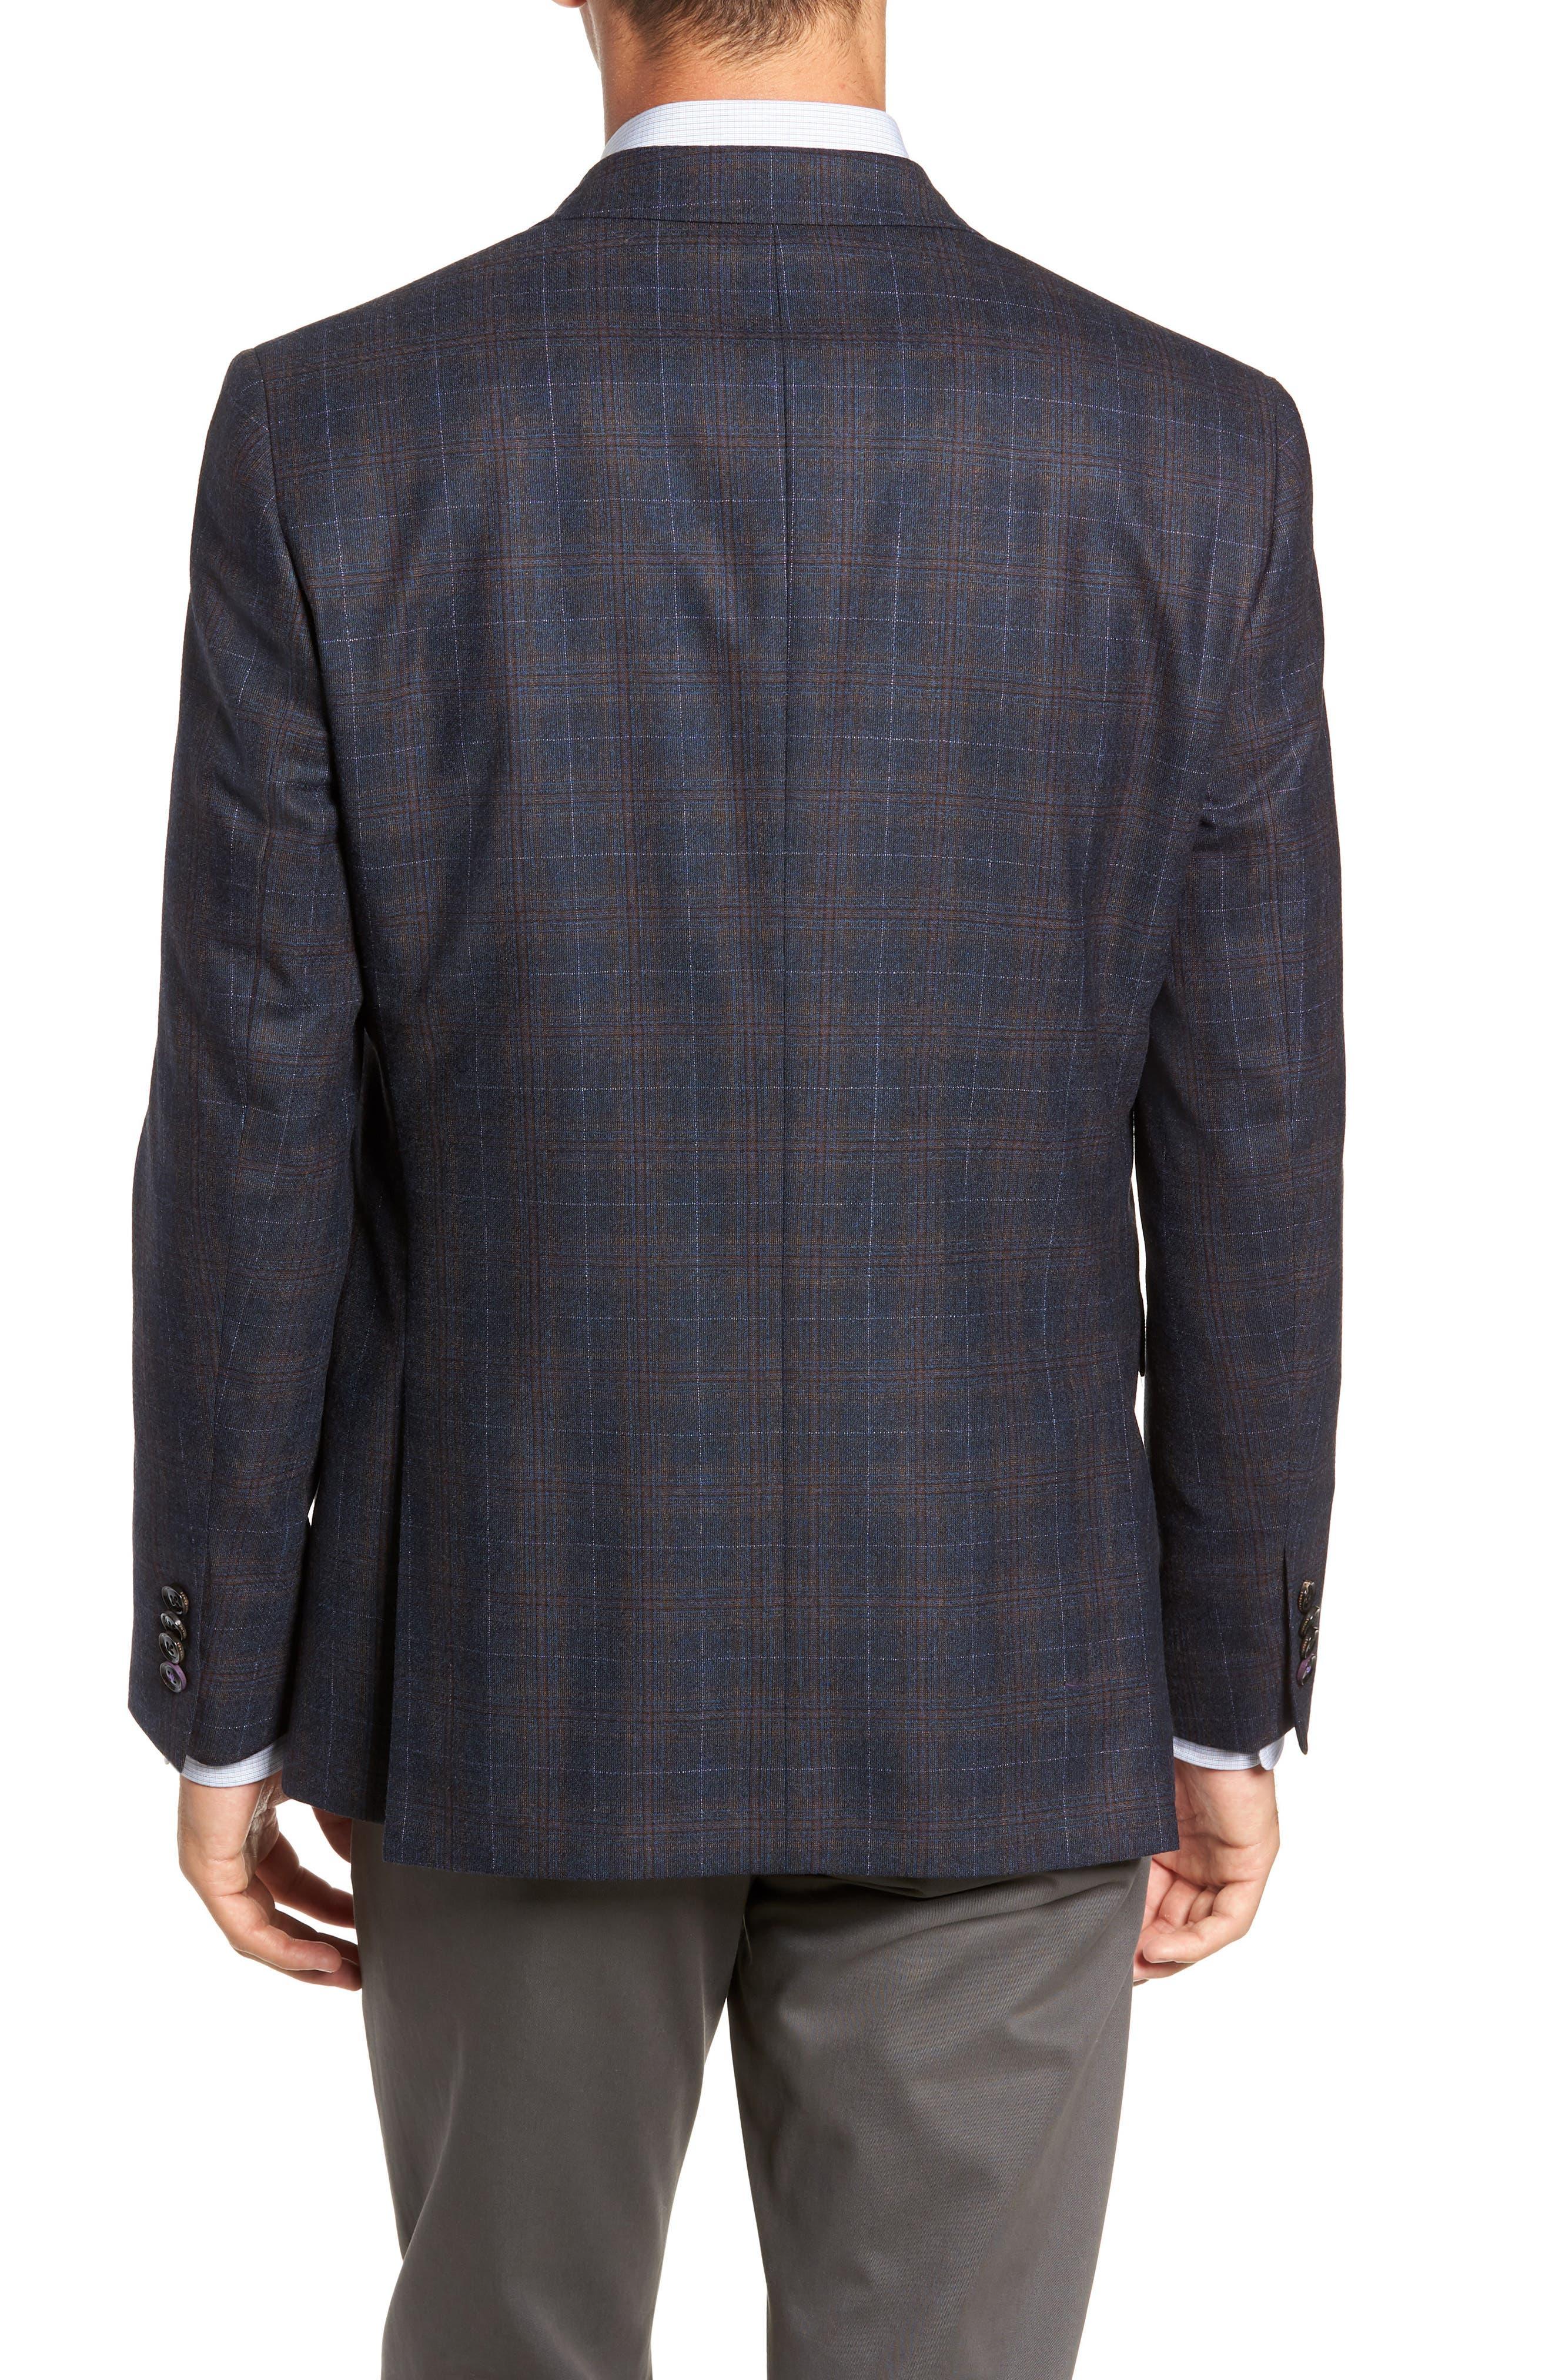 Jay 2B Trim Fit Plaid Wool Sport Coat,                             Alternate thumbnail 2, color,                             BLUE PLAID